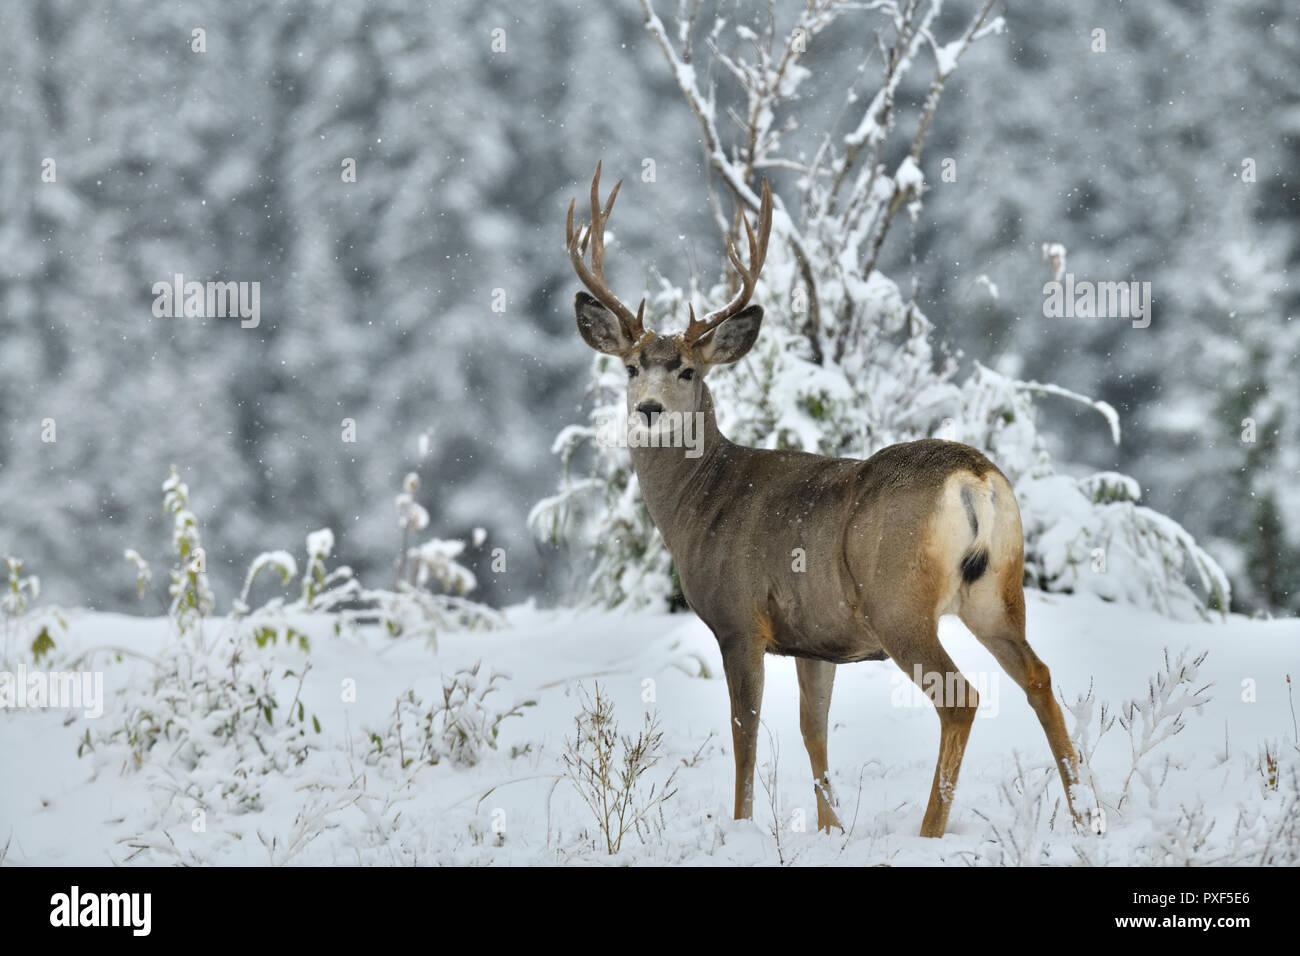 A mature male mule deer 'Odocoileus hemionus'; standing looking back in the freshly falling snow in rural Alberta Canada. - Stock Image